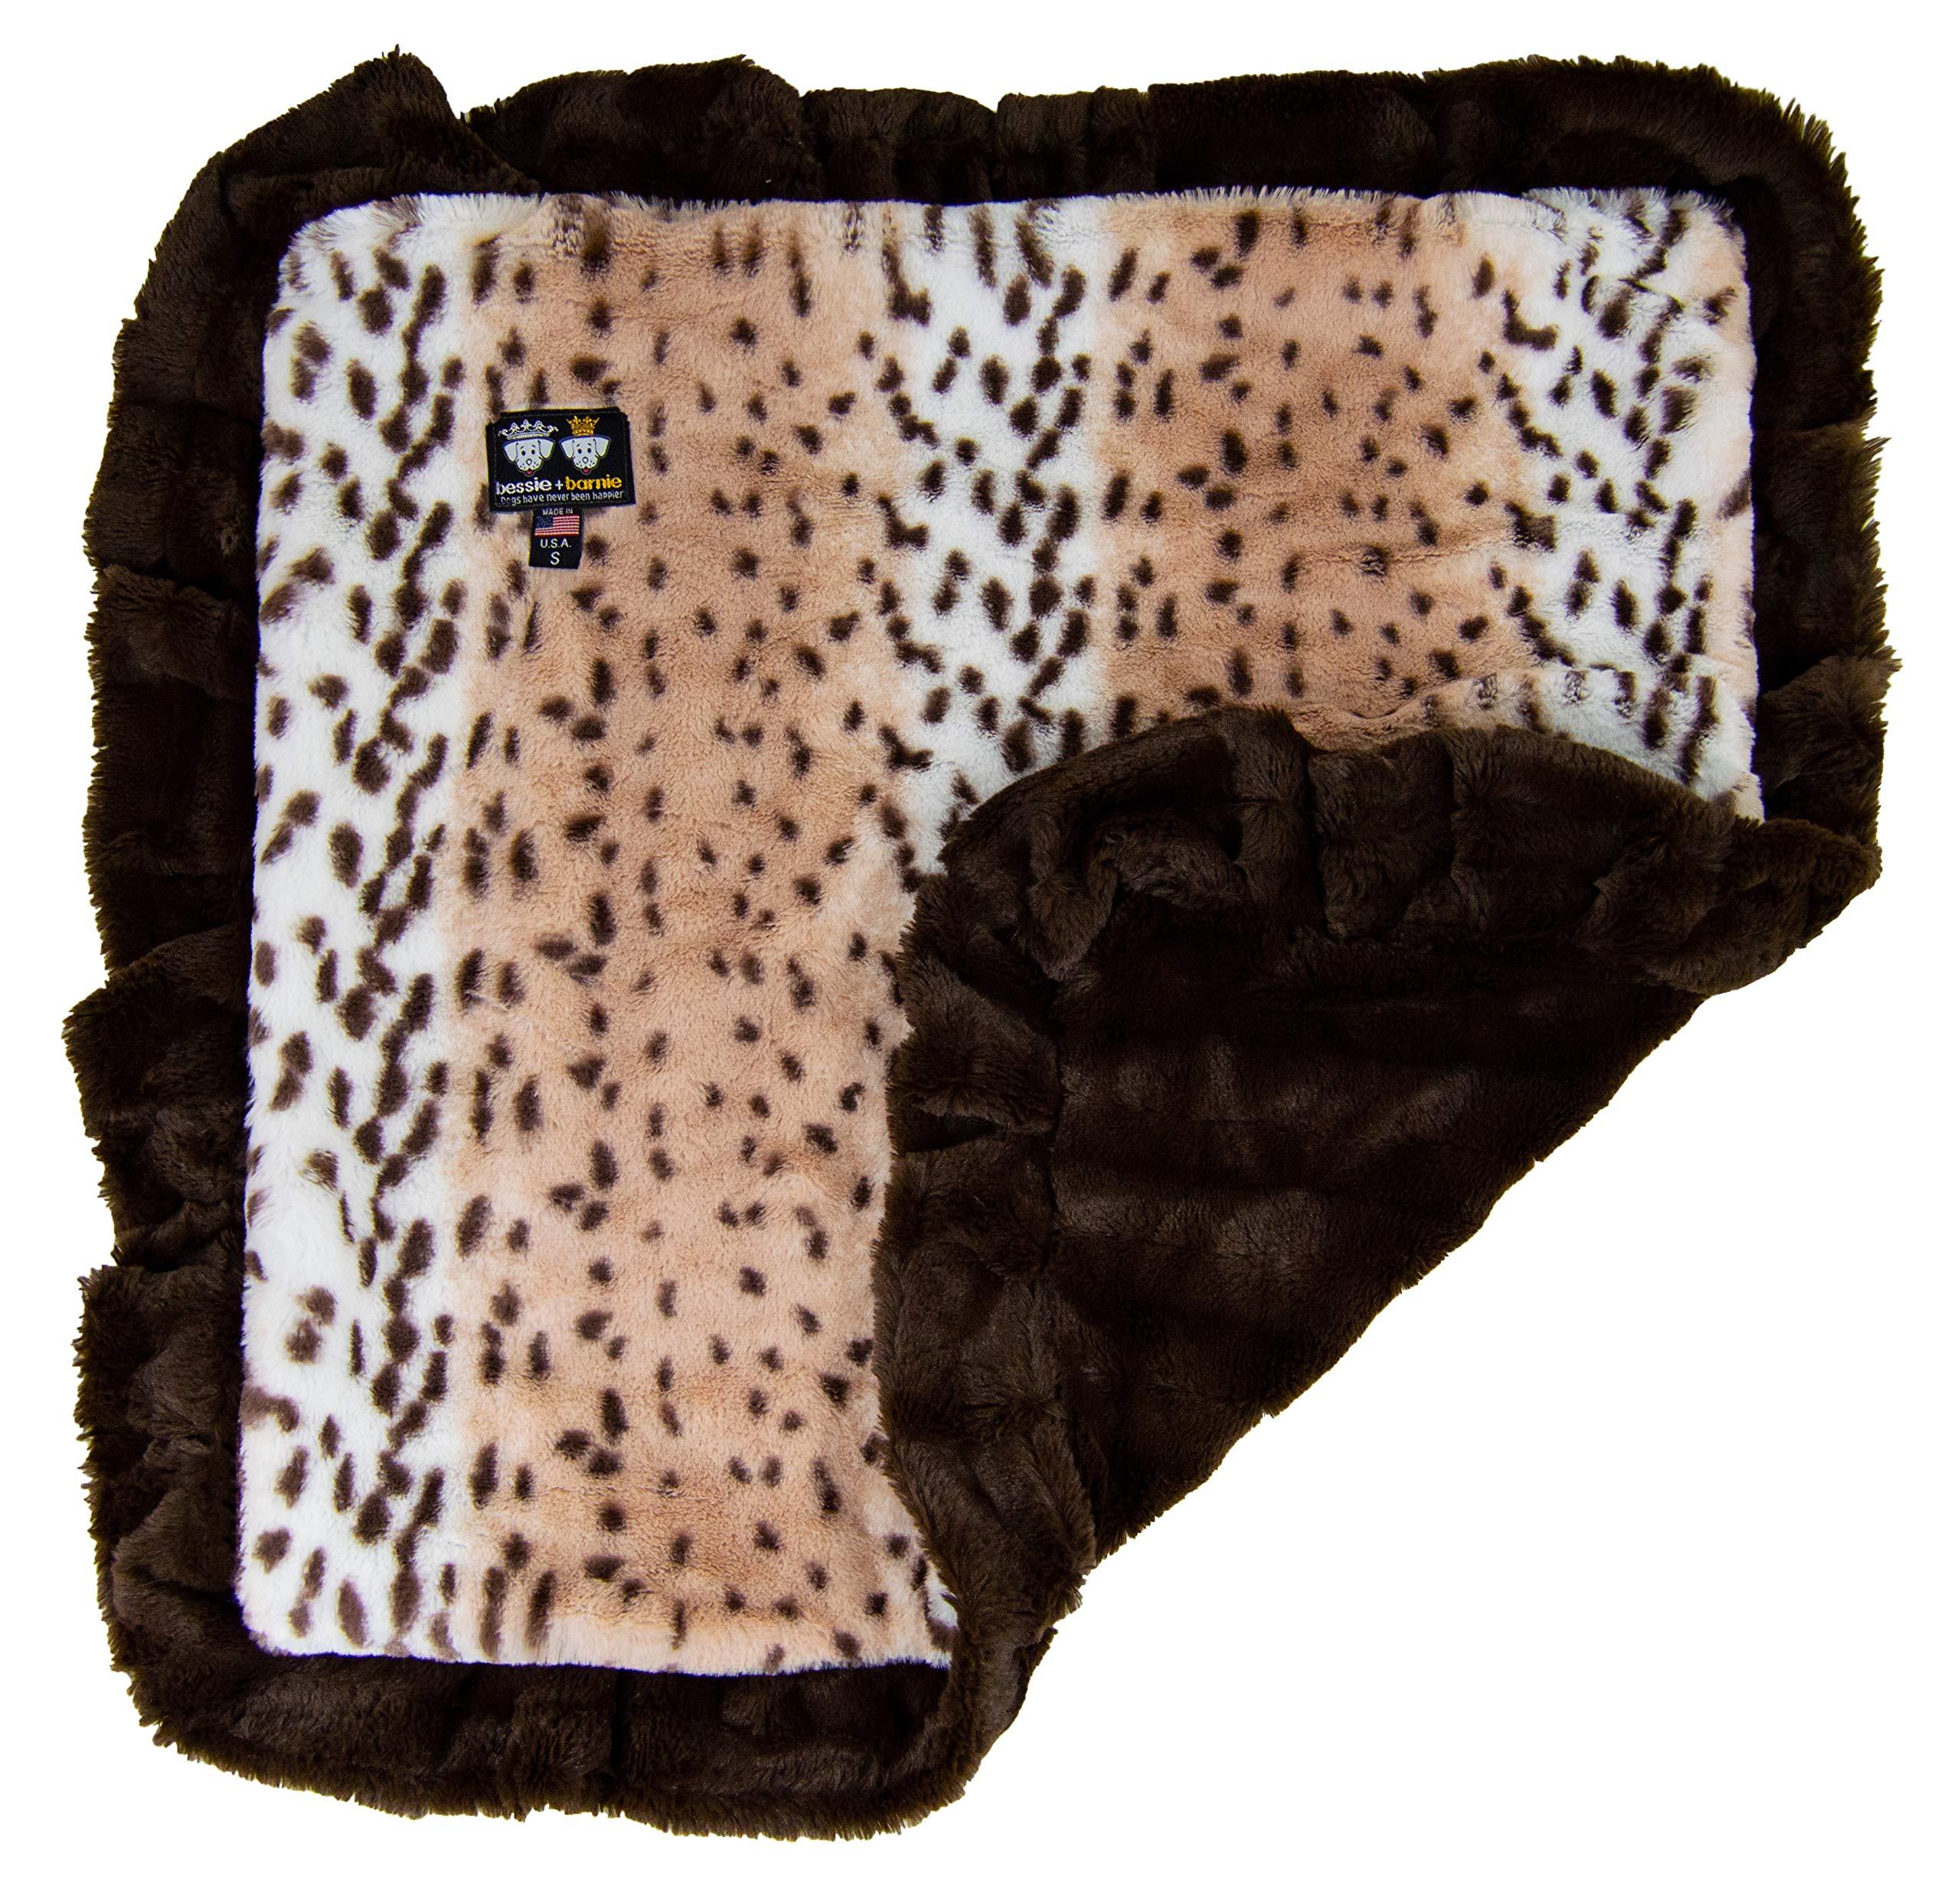 BESSIE AND BARNIE Aspen Snow Leopard/Godiva Brown (Ruffles) Luxury Ultra Plush Faux Fur Pet, Dog, Cat, Puppy Super Soft Reversible Blanket (Multiple Sizes)